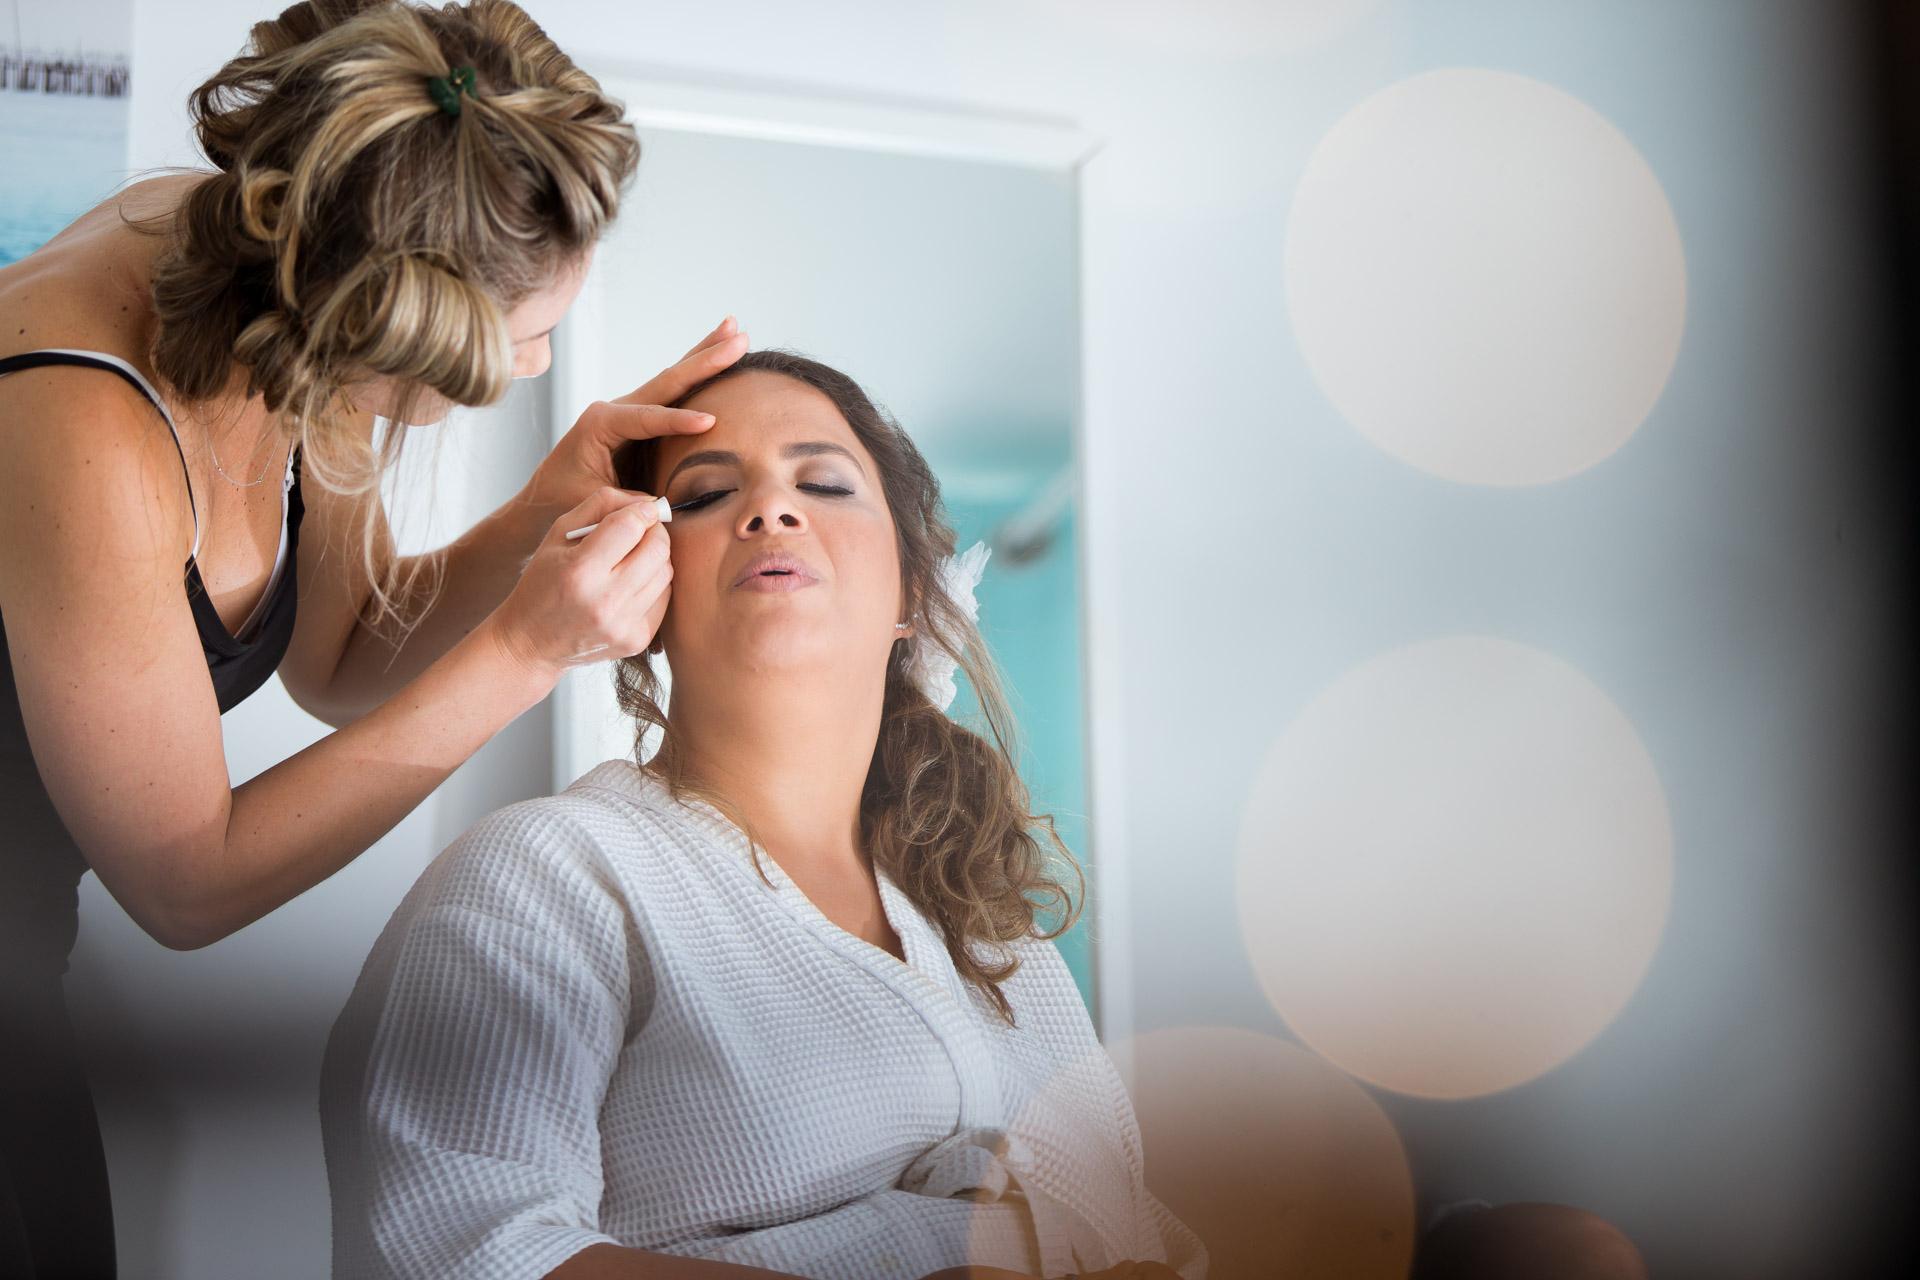 maquillage mariee avec effet bokeh